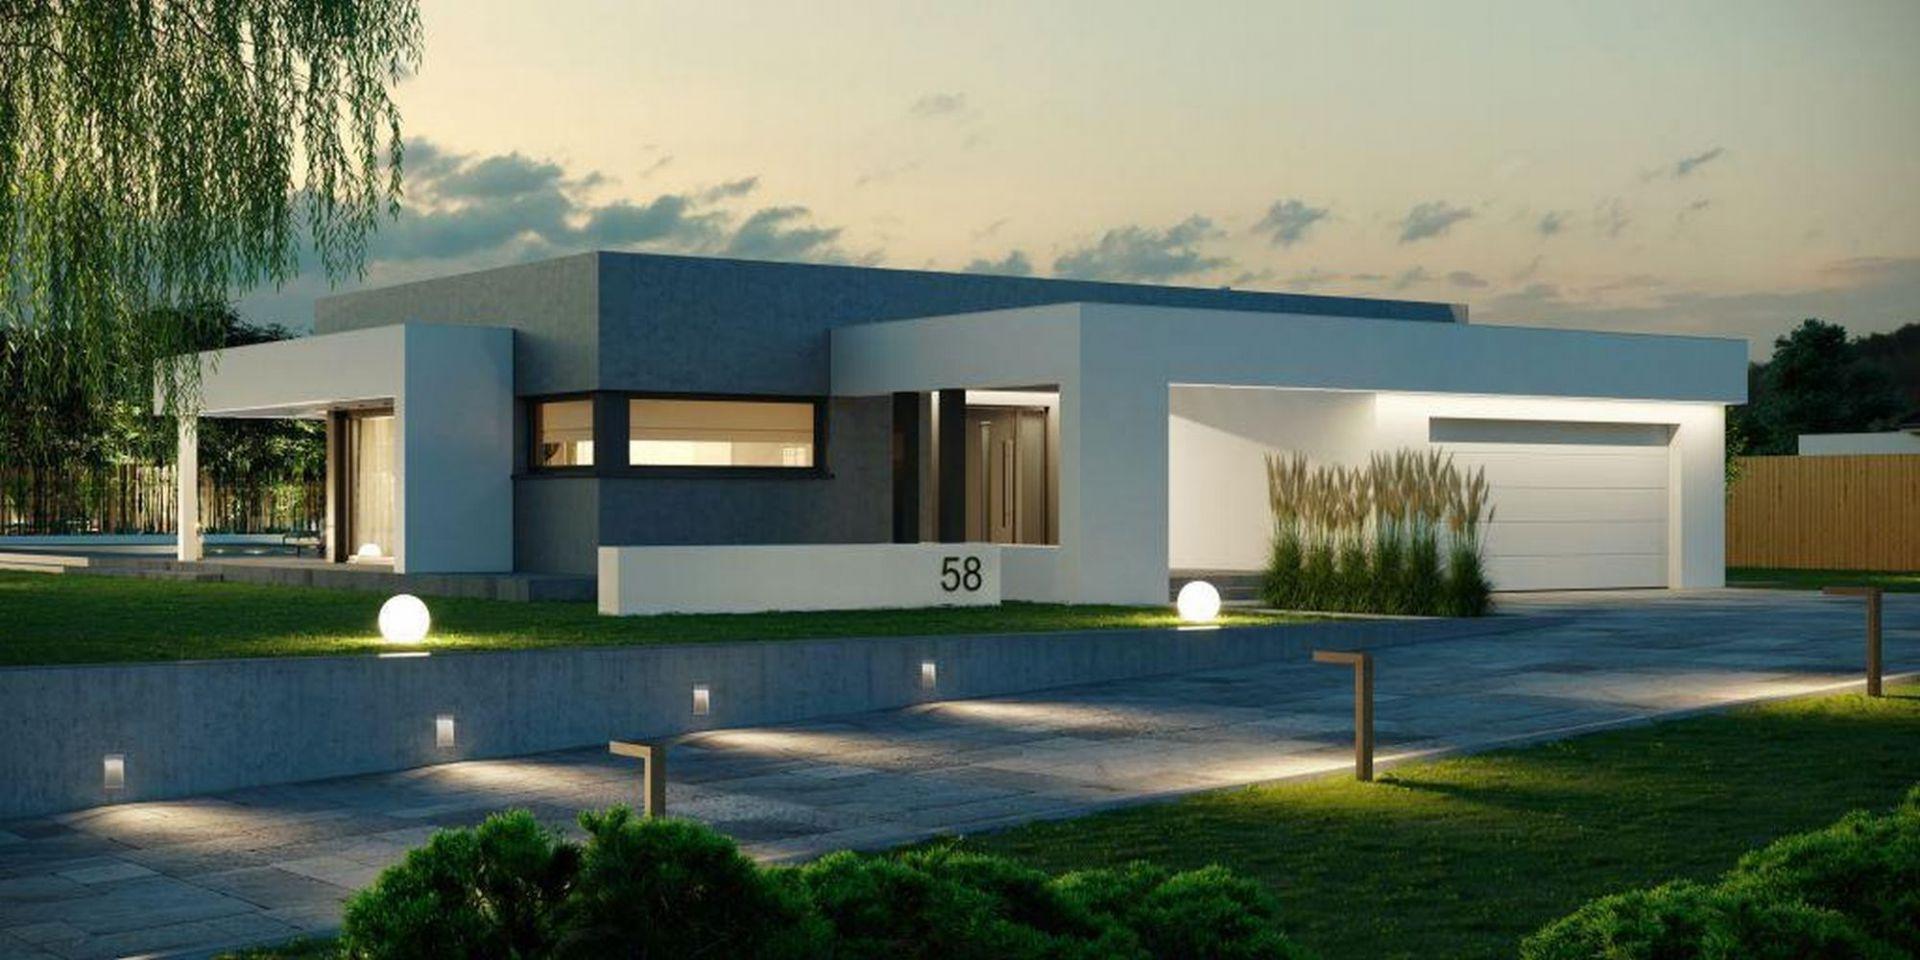 Wybieramy projekt domu - porady eksperta. Projekt: HomeKONCEPT 58. Fot. HomeKONCEPT